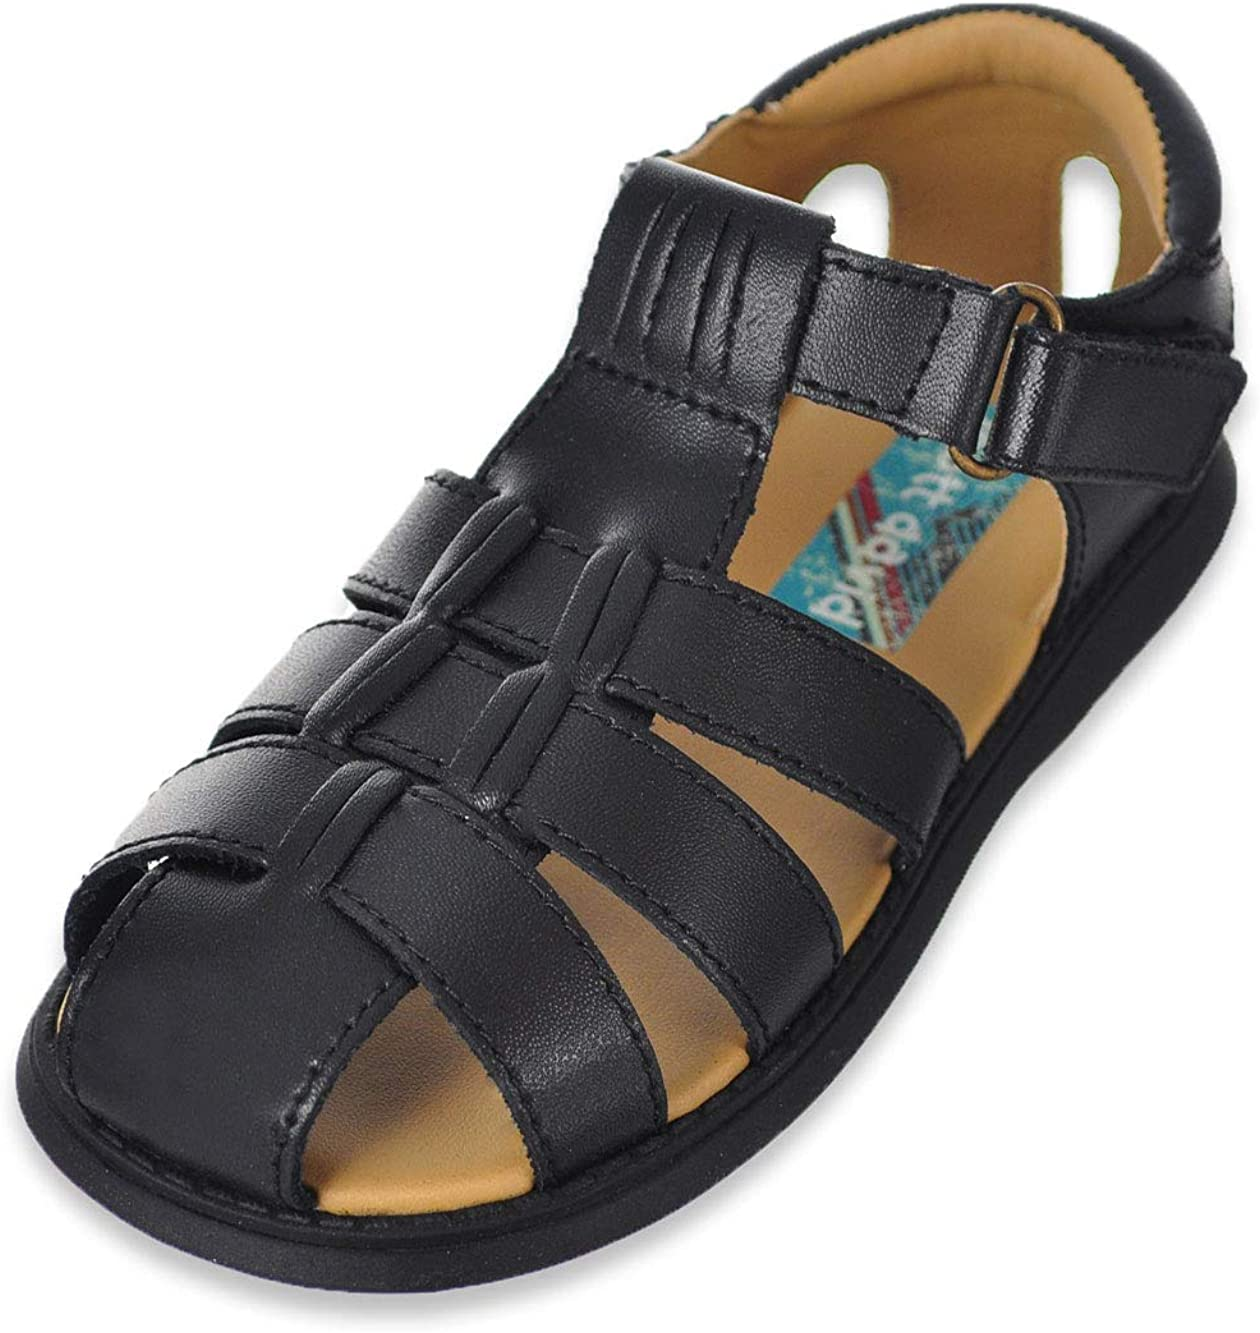 Scott David Boys' Sailor Sandals - Black, 10 Toddler